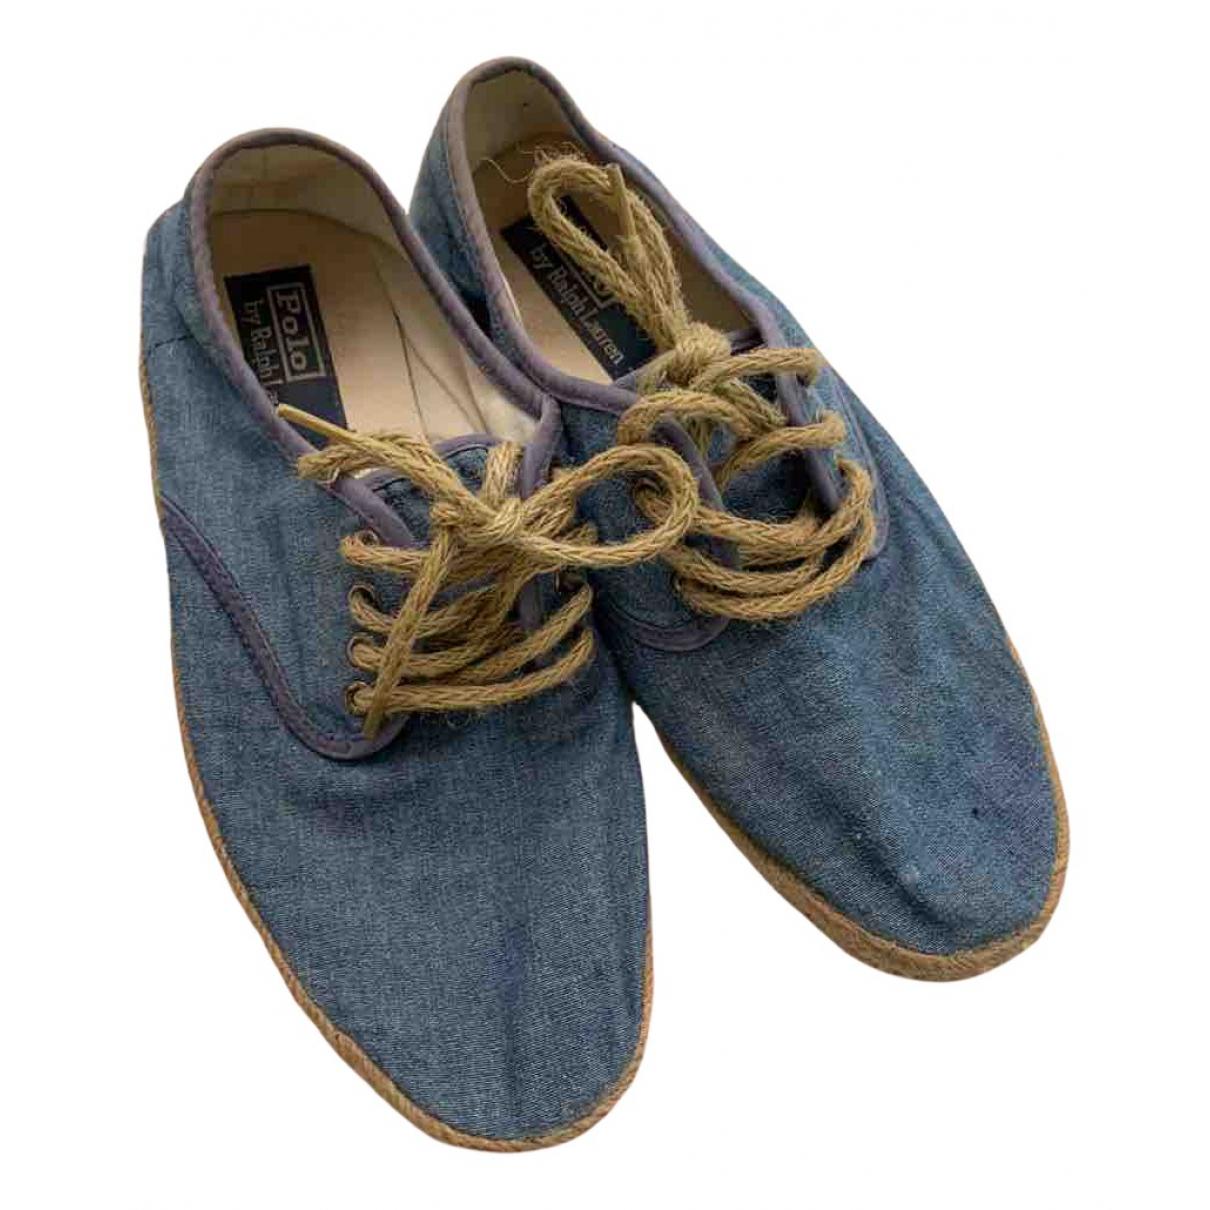 Polo Ralph Lauren \N Espadrilles in  Blau Leinen